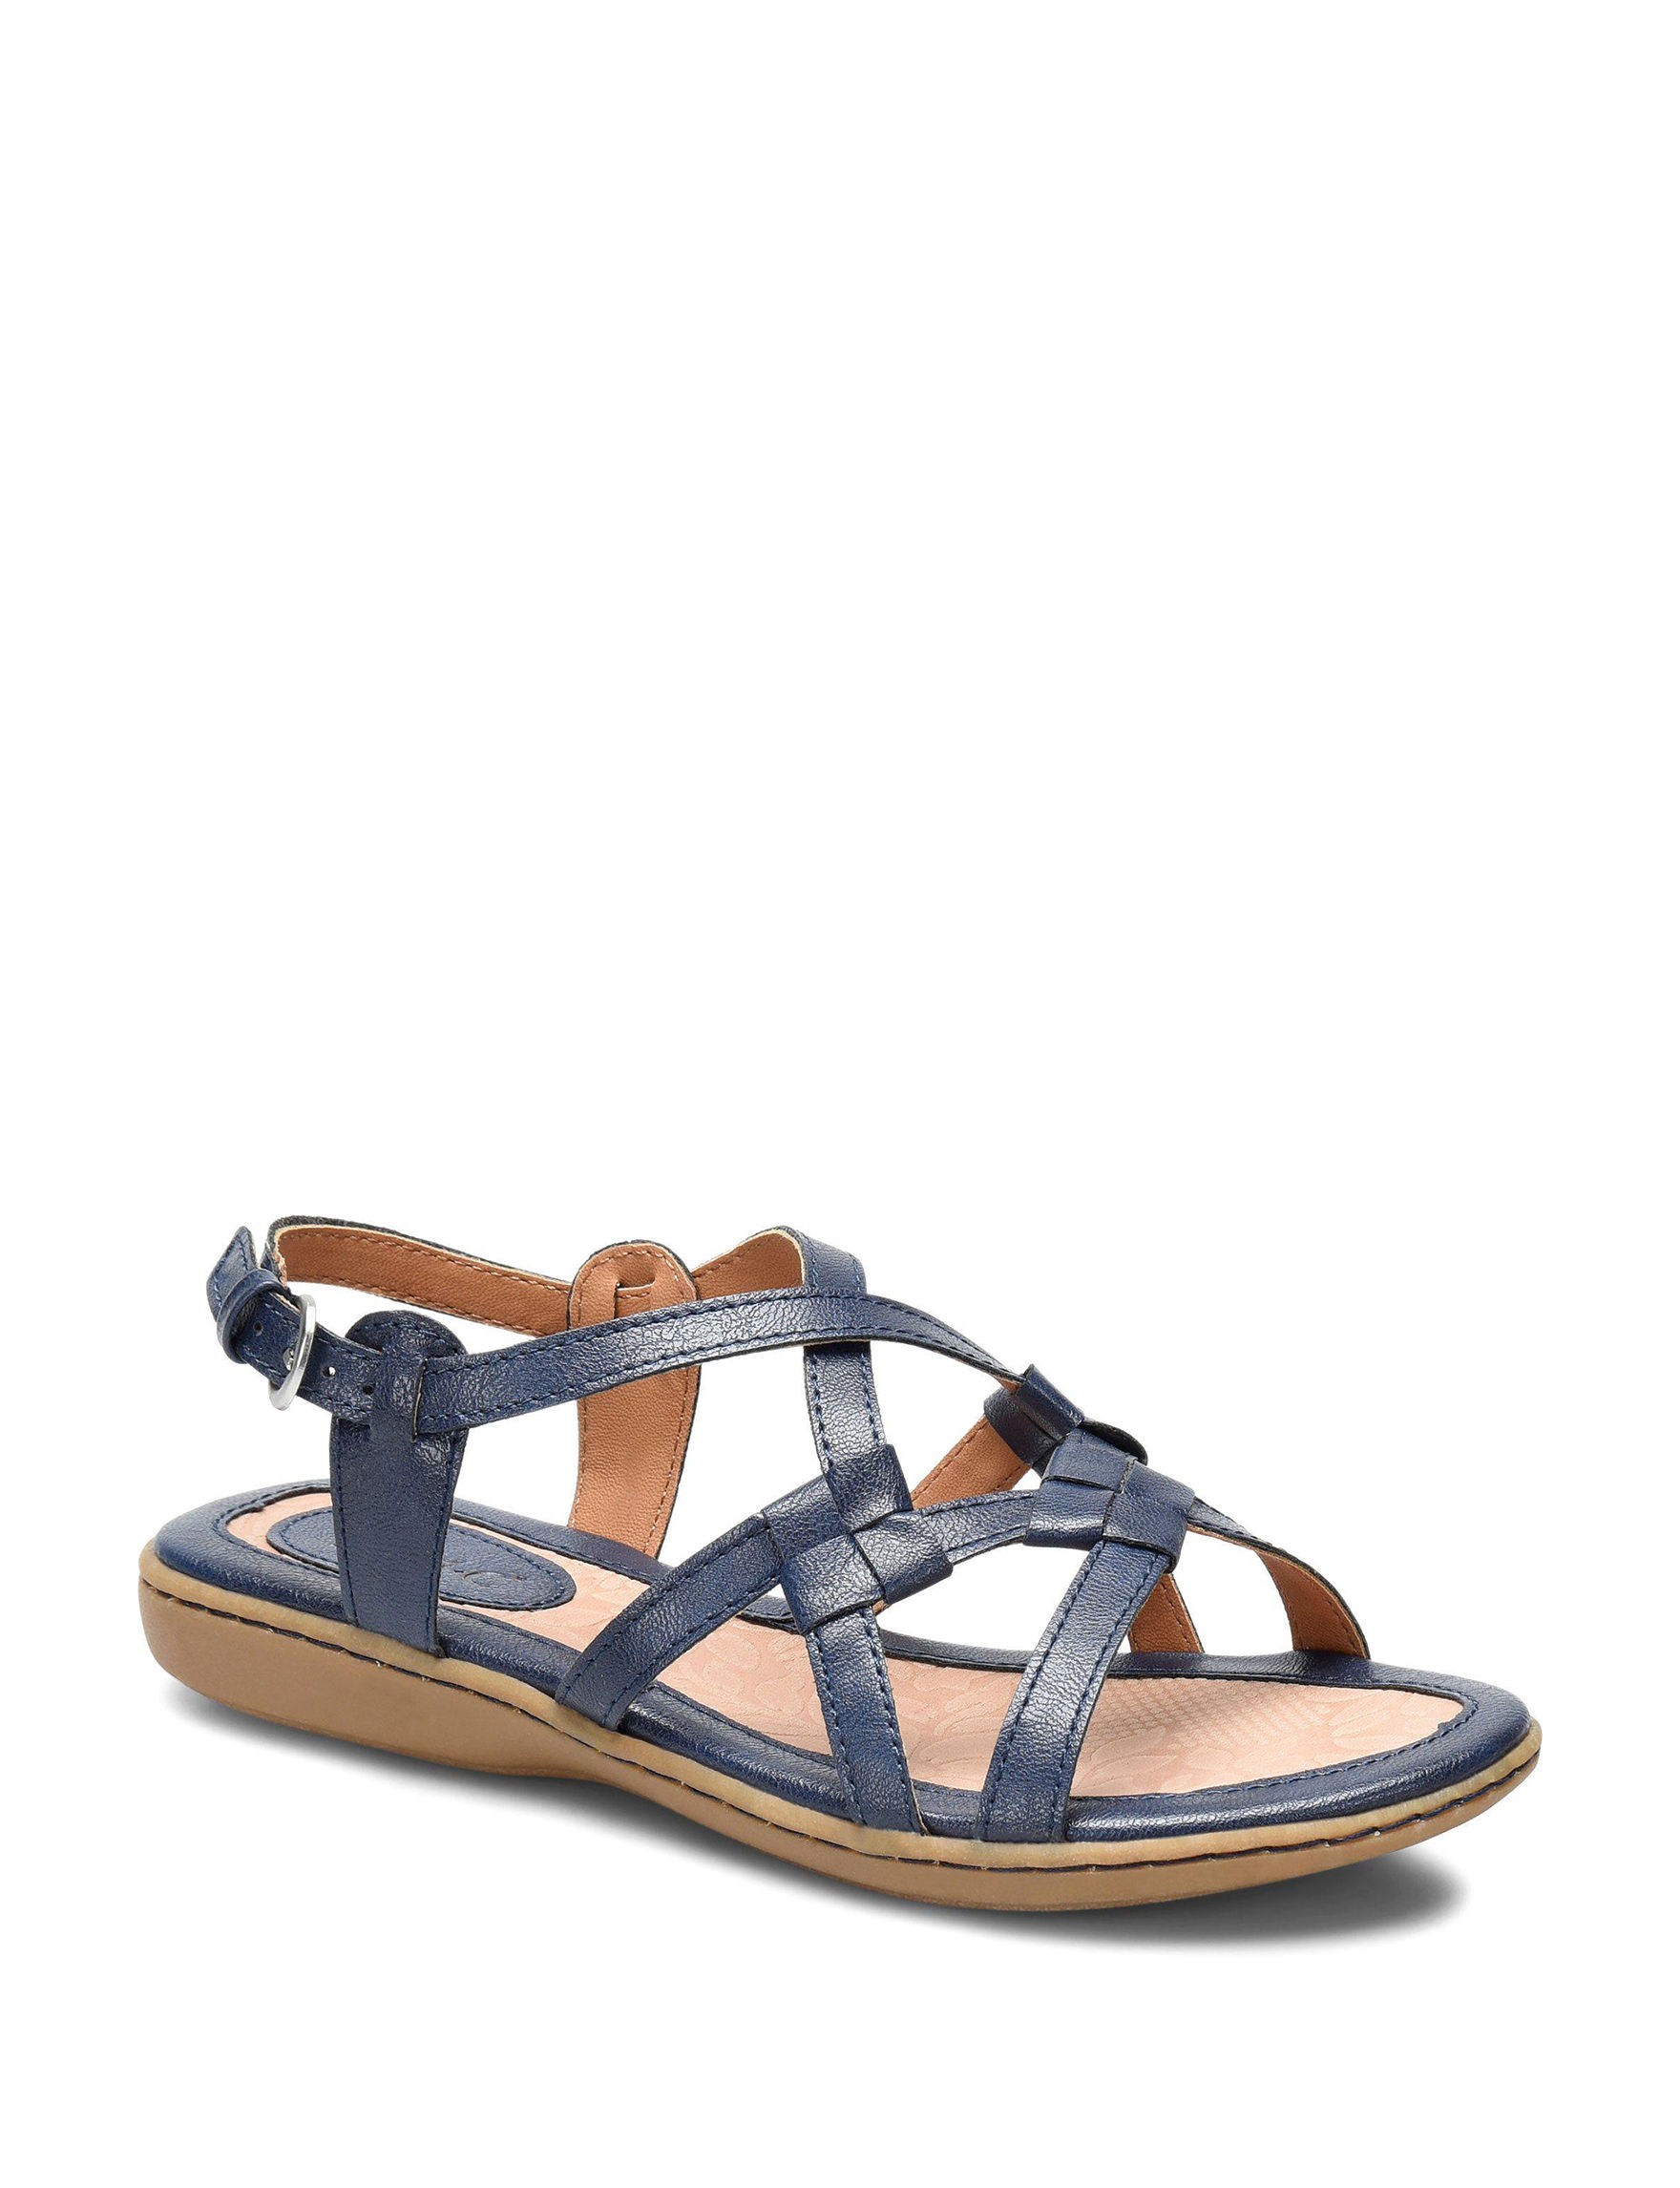 B.O.C. Navy Flat Sandals Comfort